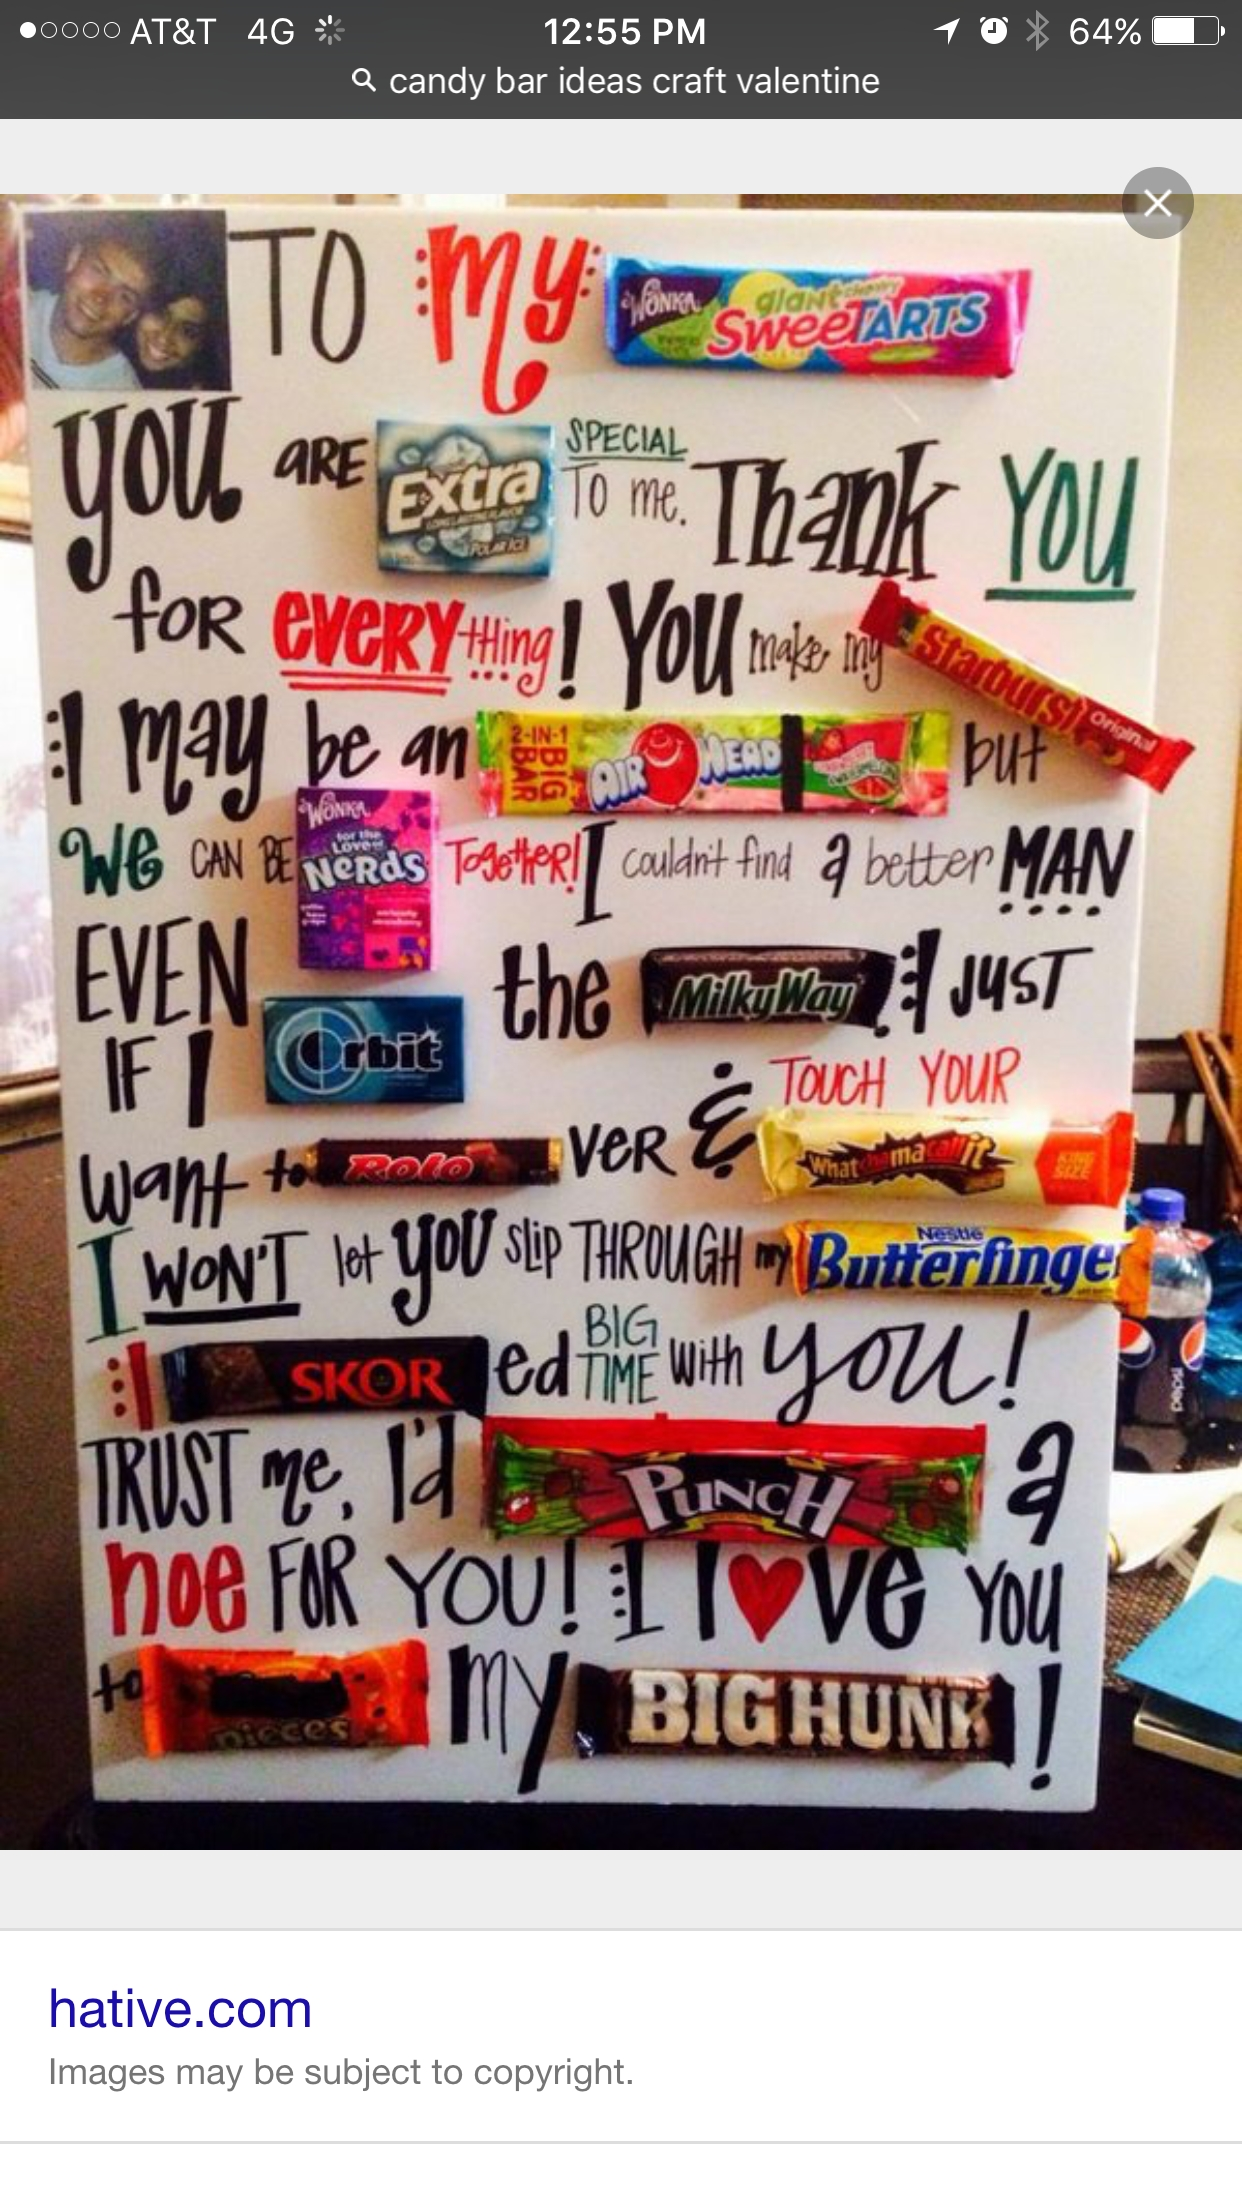 10 Unique Birthday Gift Ideas For Your Boyfriend pinvpk fun w pauline joseph on valentine preschool ideas 2020